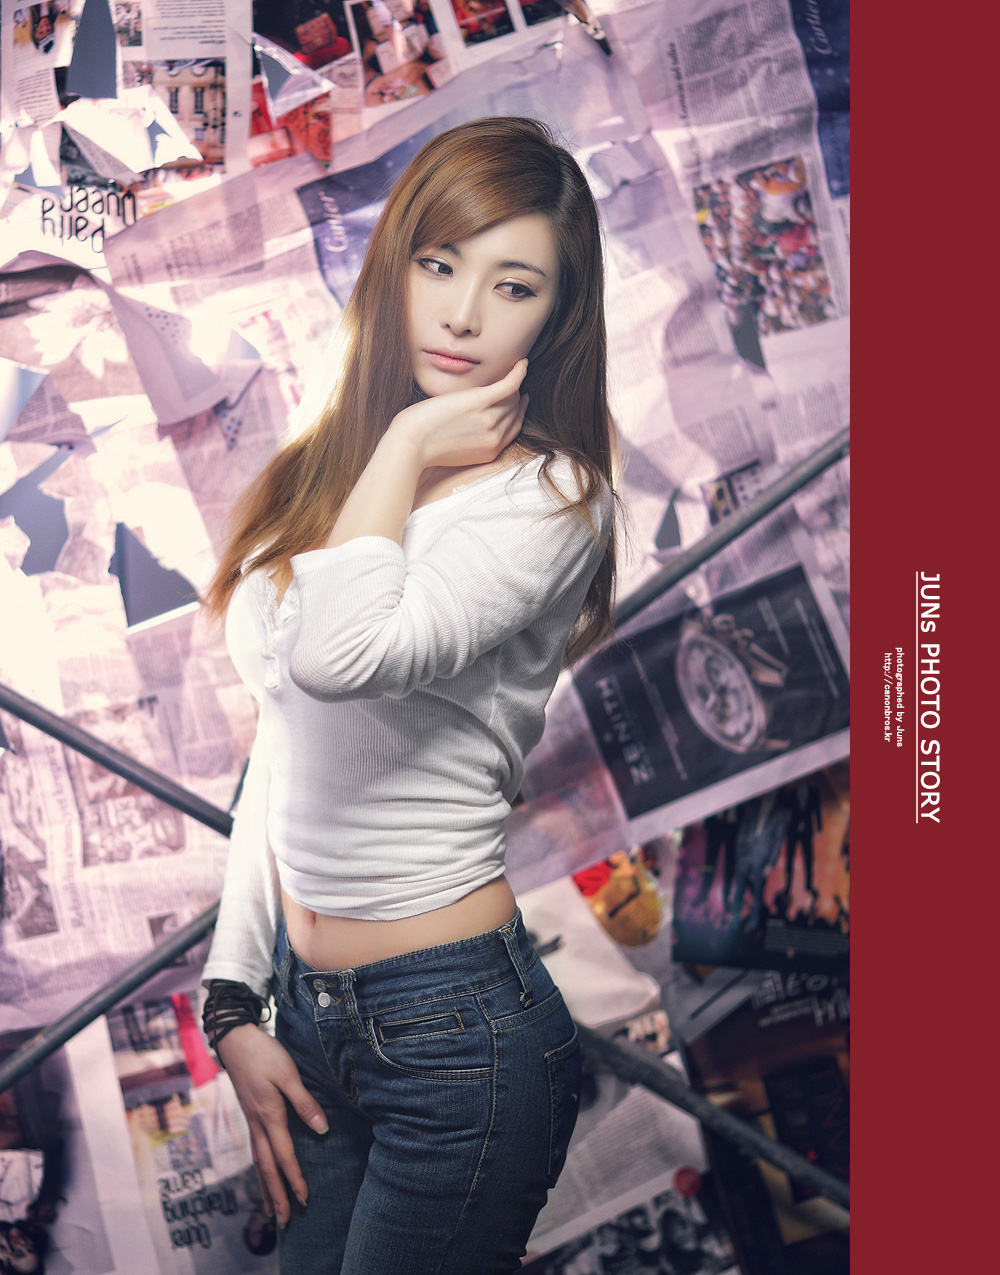 xxx nude girls: Jo Se Hee at SIDEX 2012